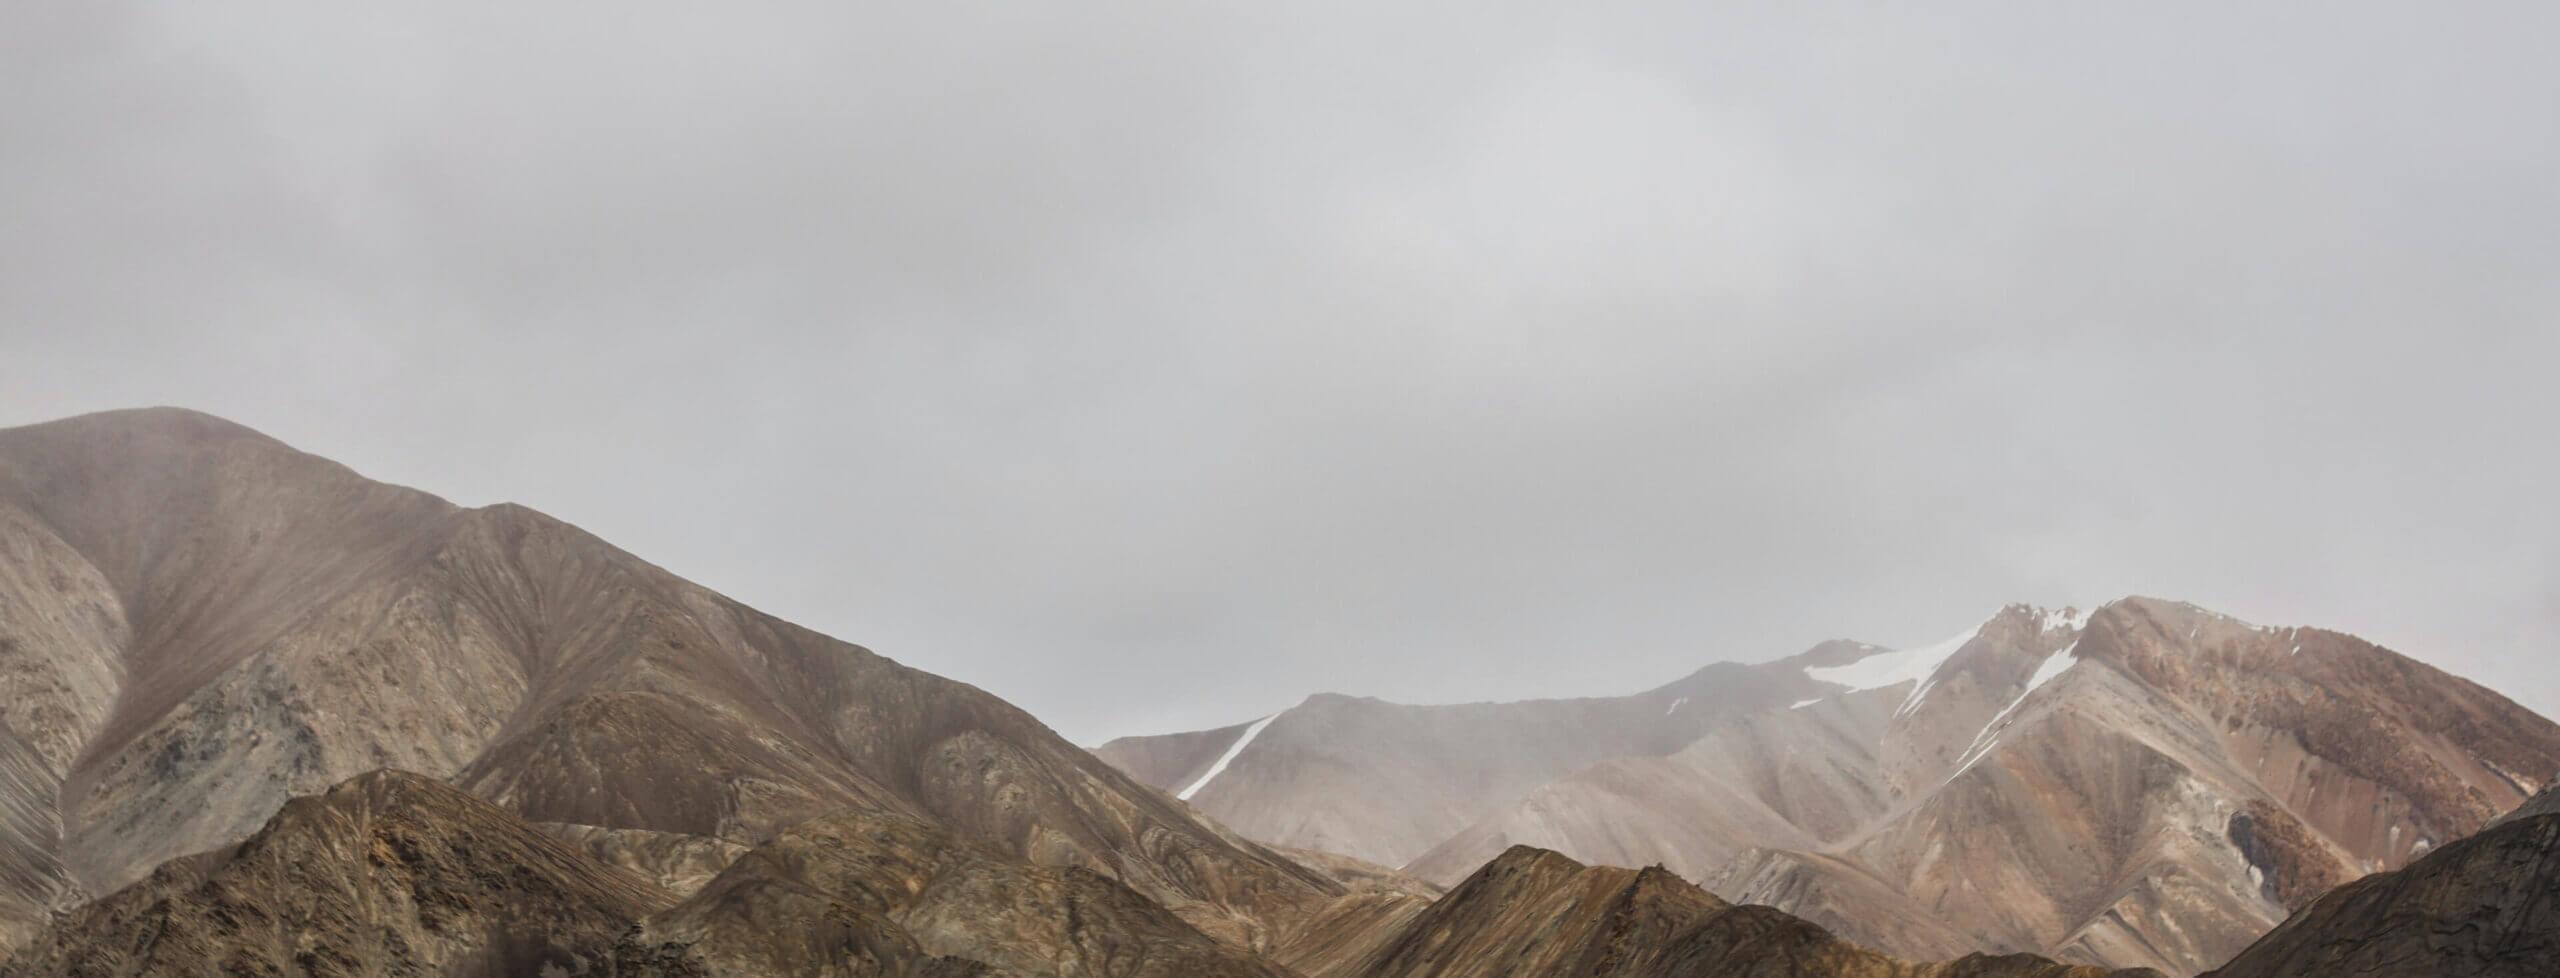 Таджикистан страна